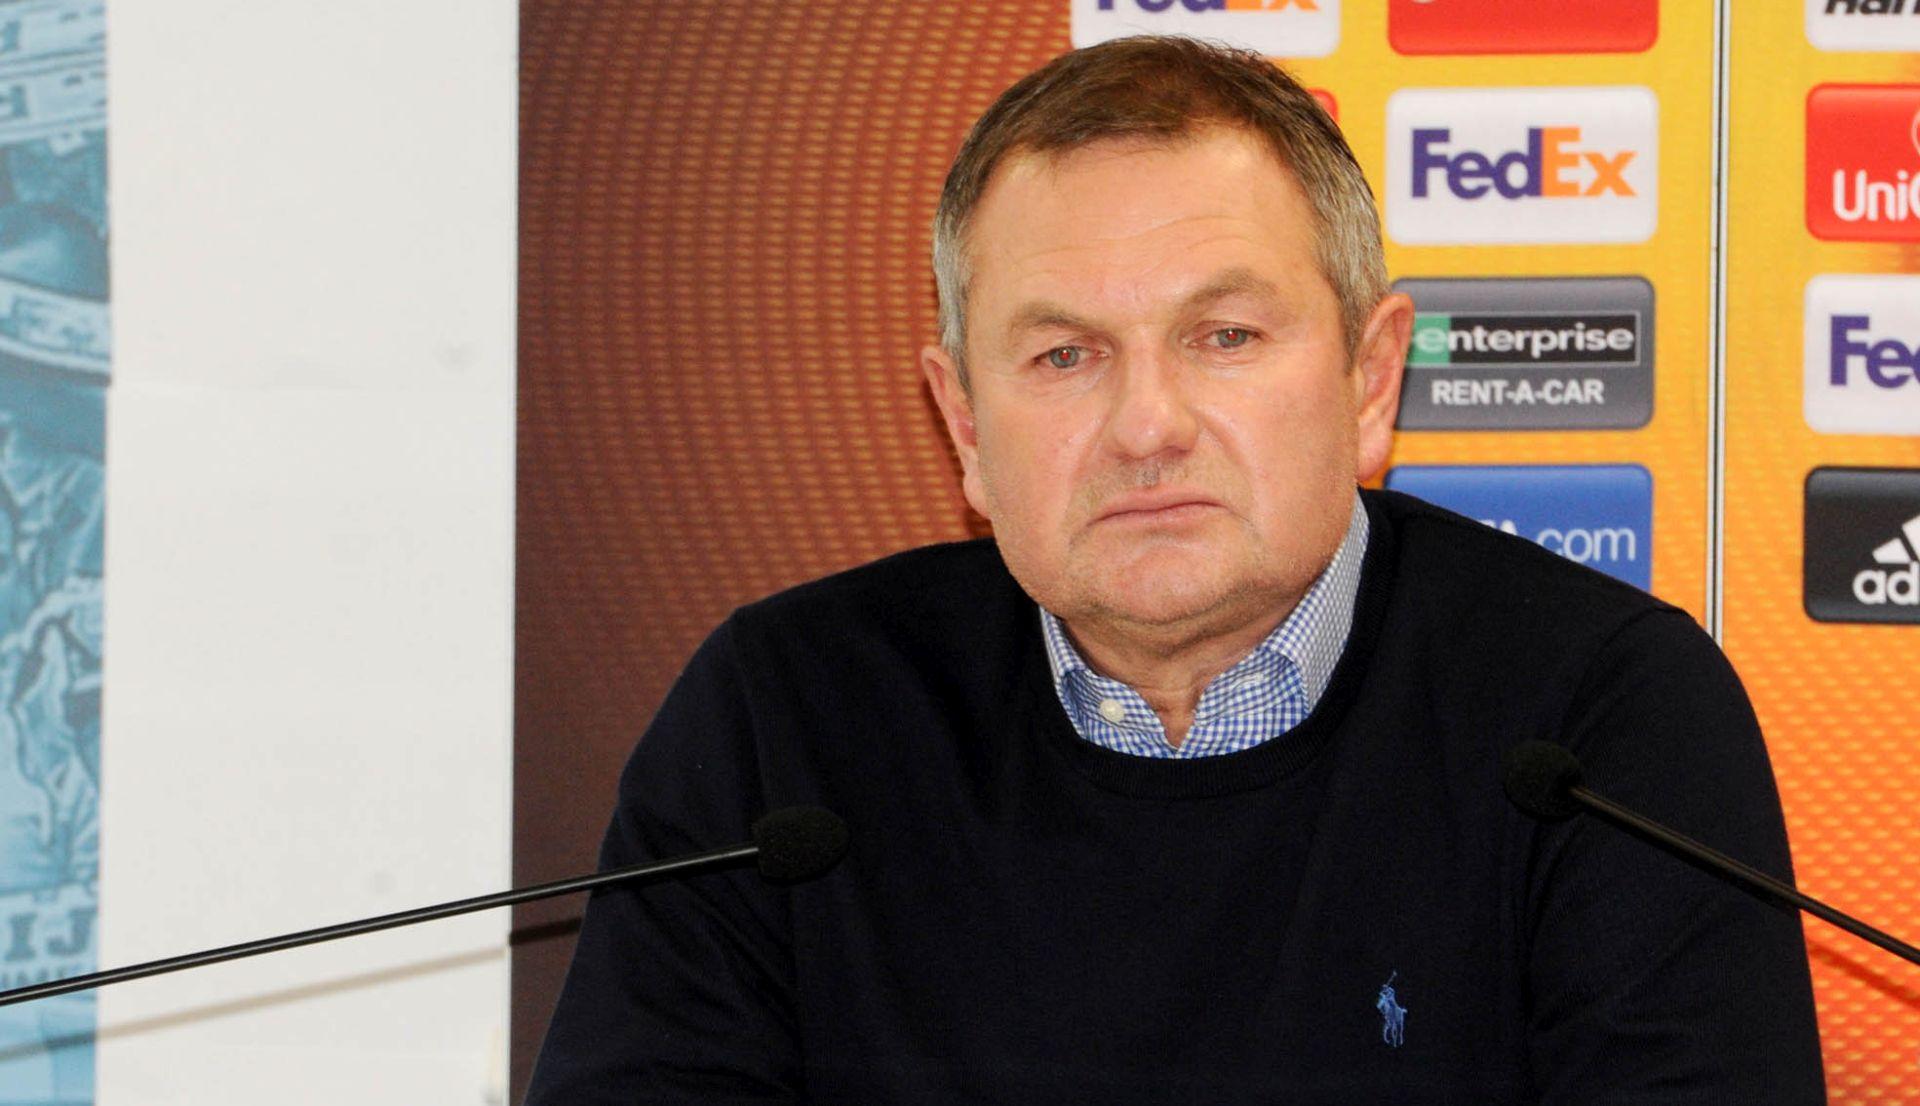 KEK 'Rasprodani stadion priznanje je za naše igre u Europi'